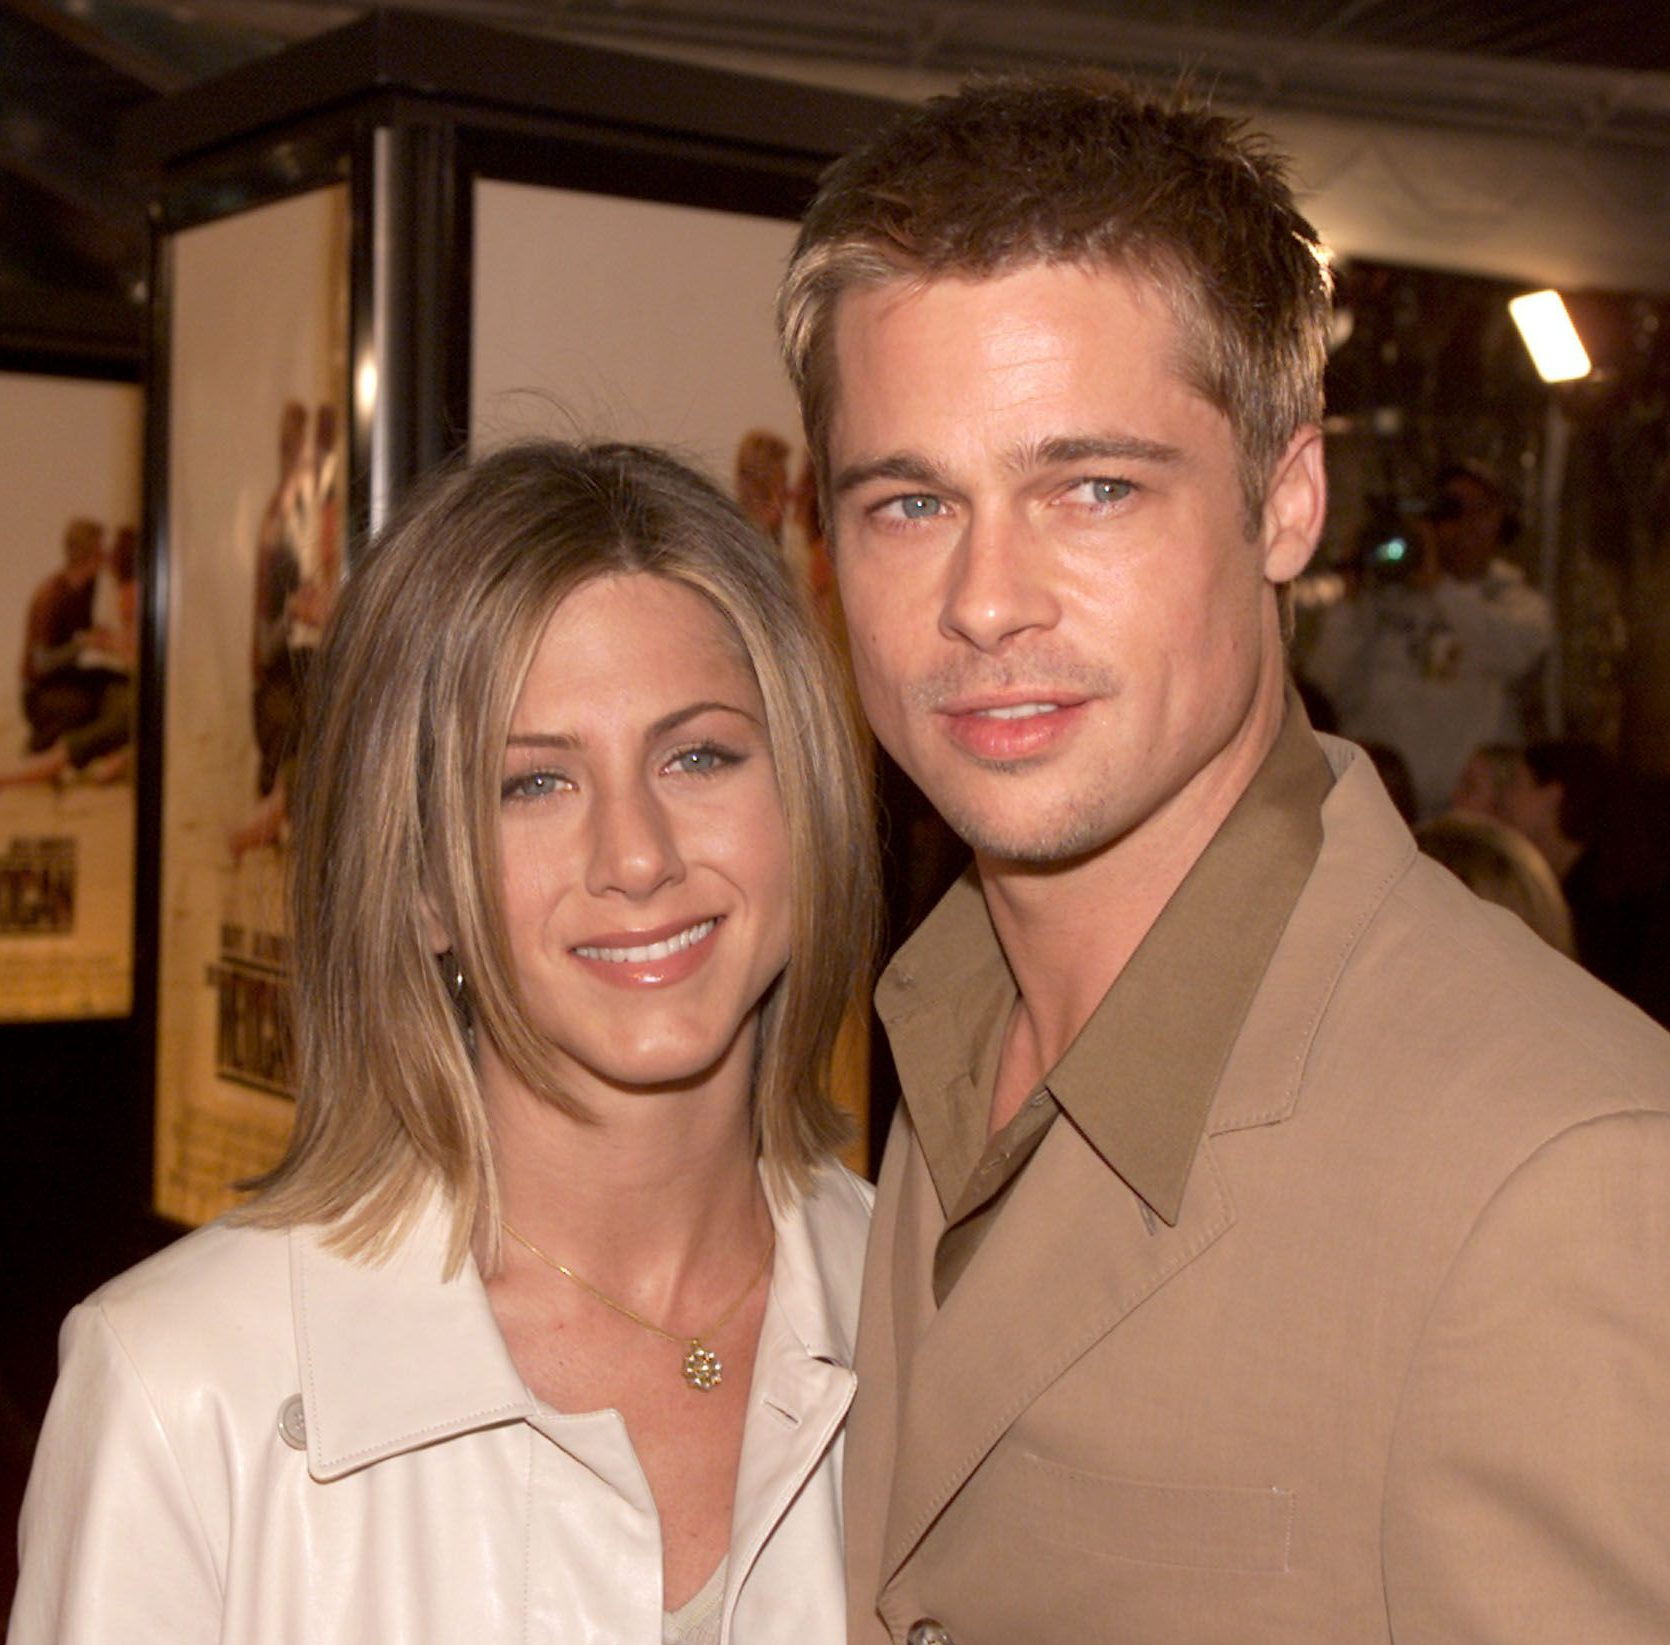 brad 30 e1565266942126 25 Things You Never Knew About Brad Pitt